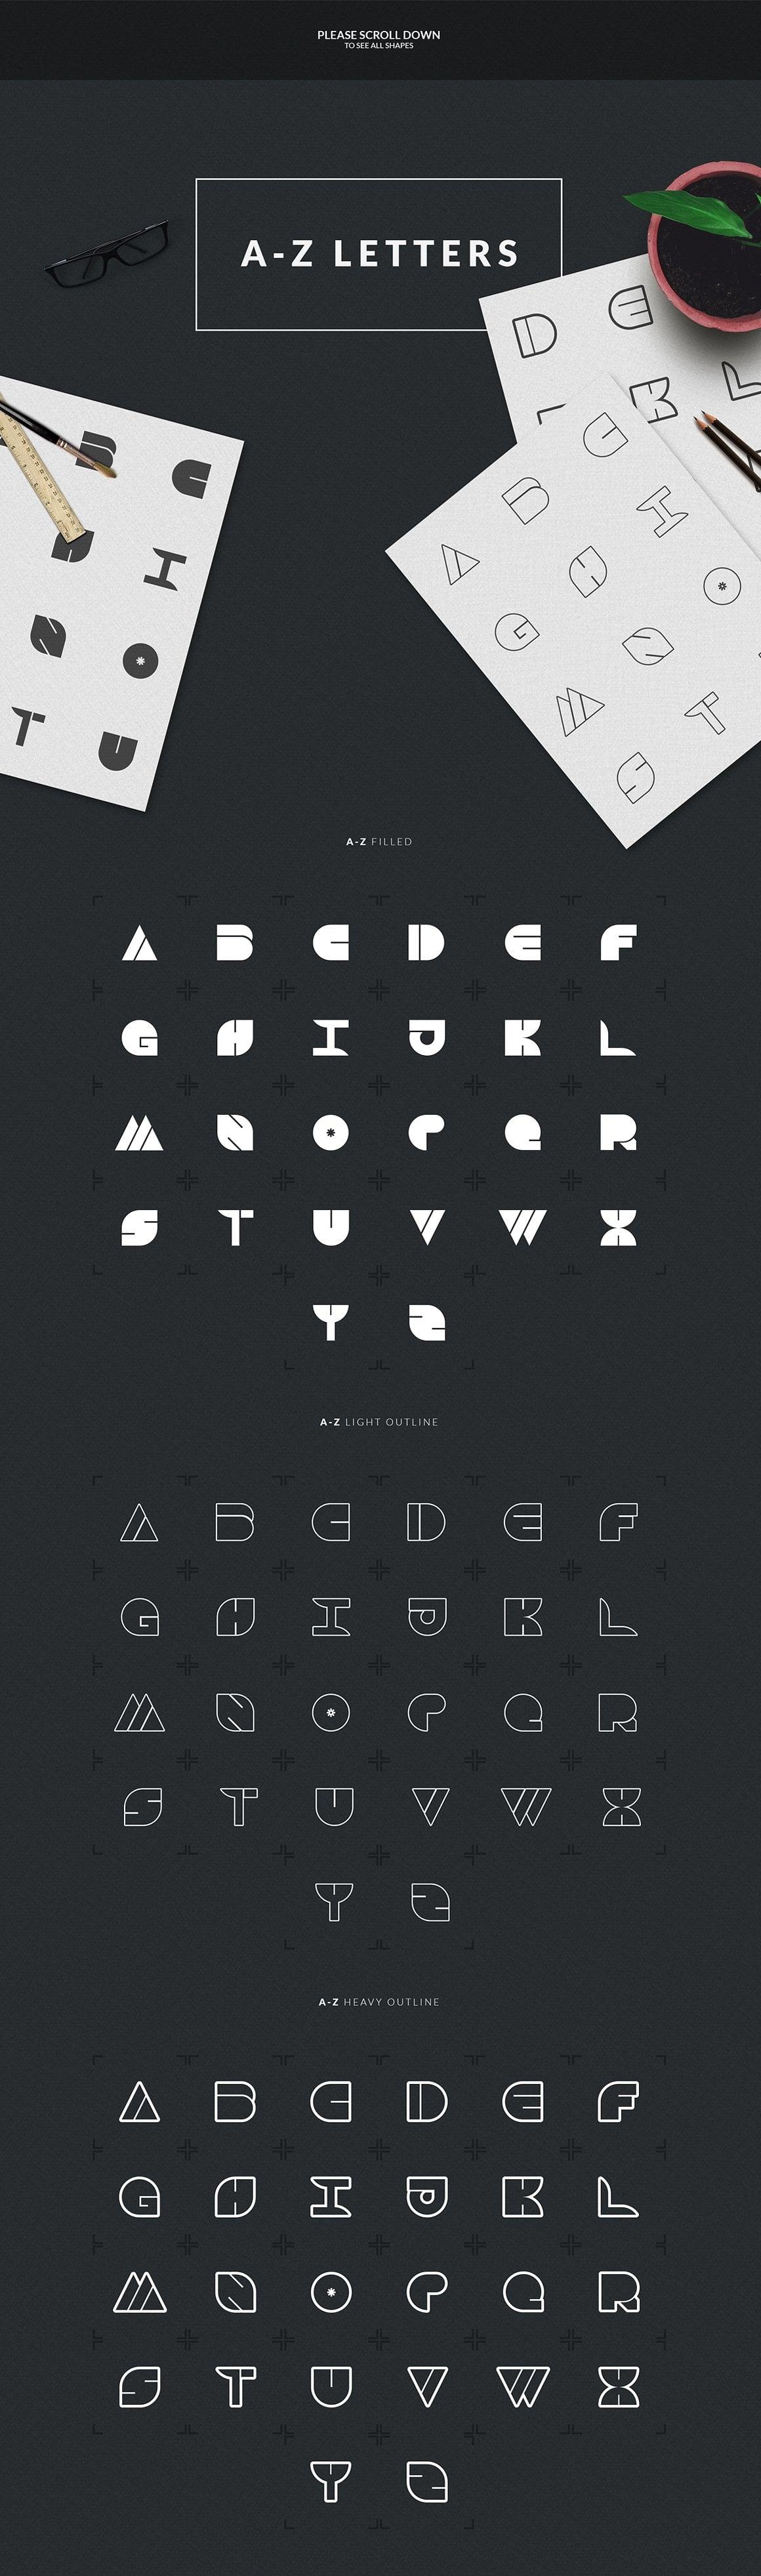 Logo Creation Kit: 409 Elements